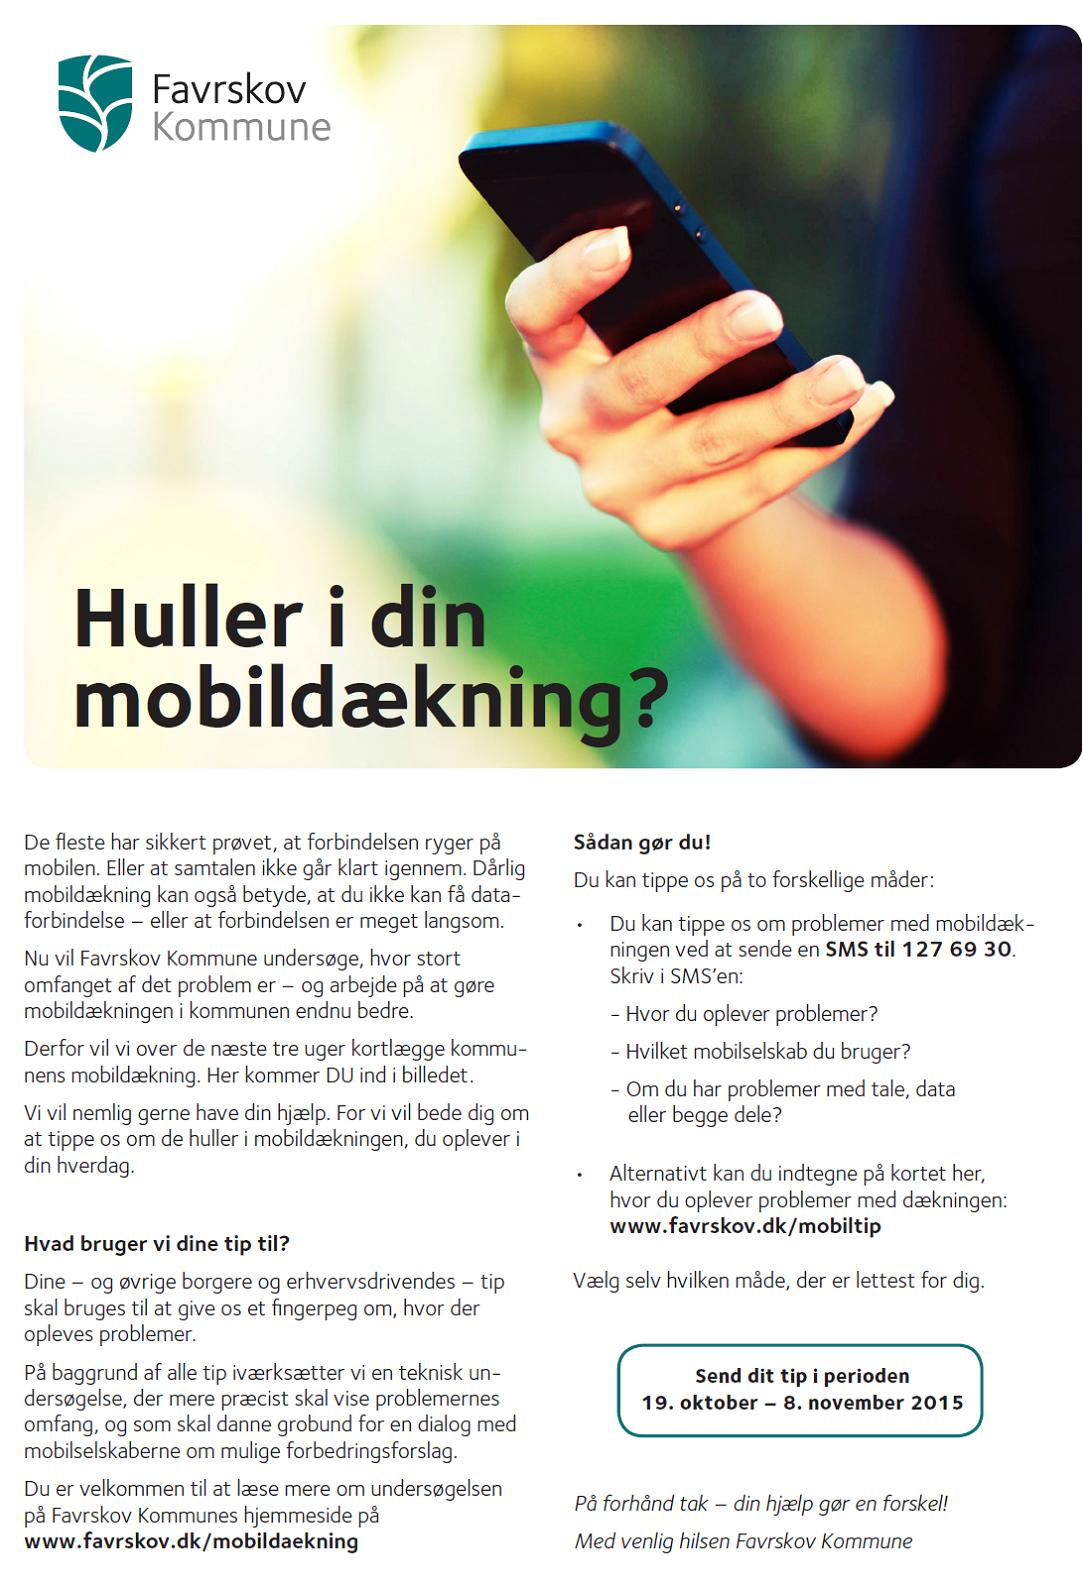 Mobilhuller